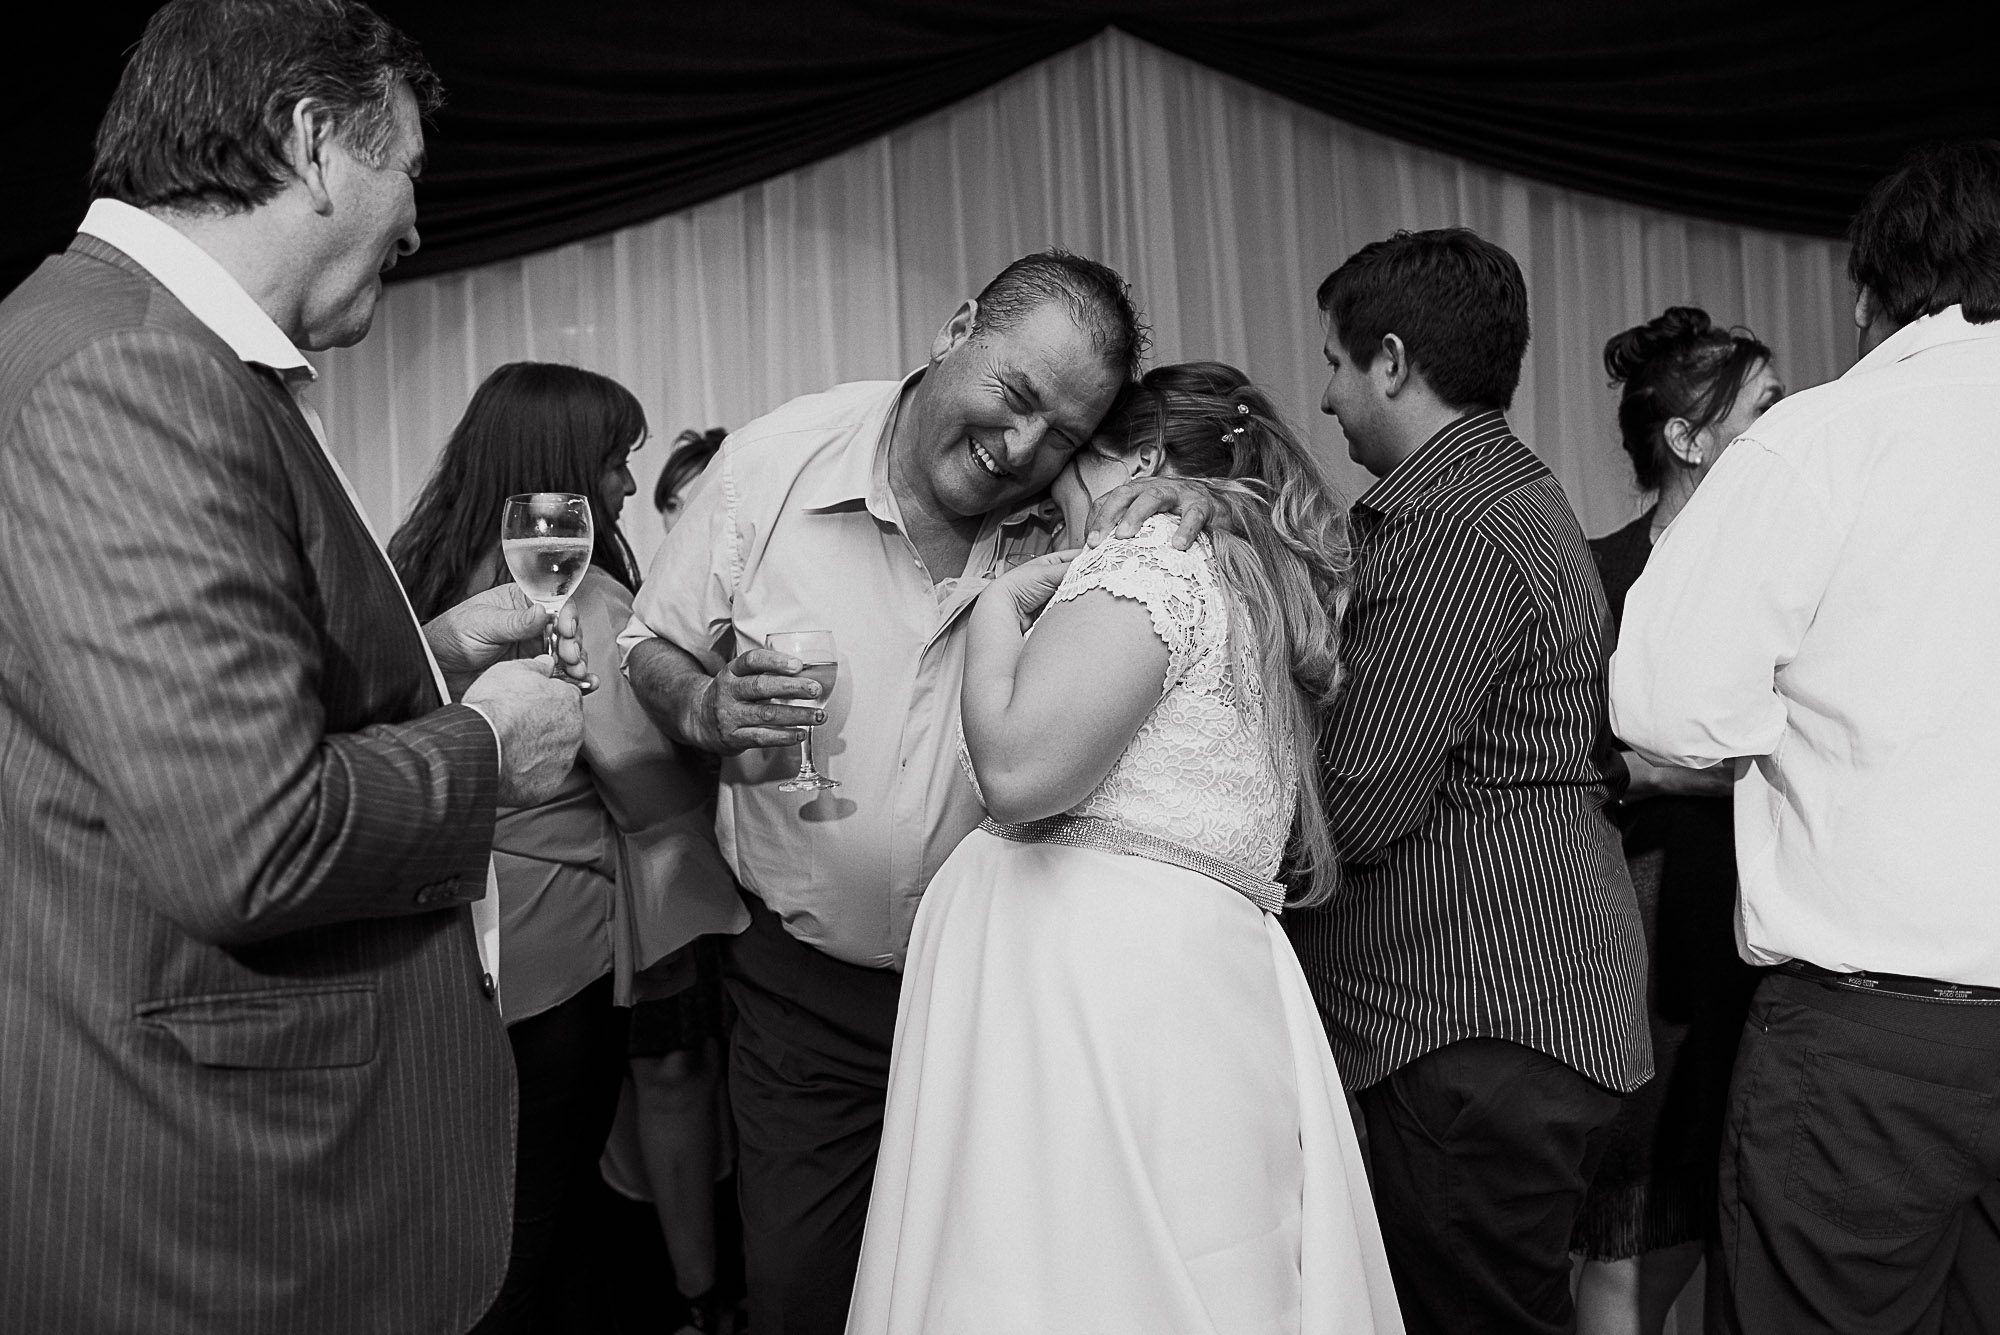 boda-vero-raul-patagonia-argentina-chilena-fotografo-de-bodas-argentina-casamiento-en-patagonia-gabriel-roa-photography-23